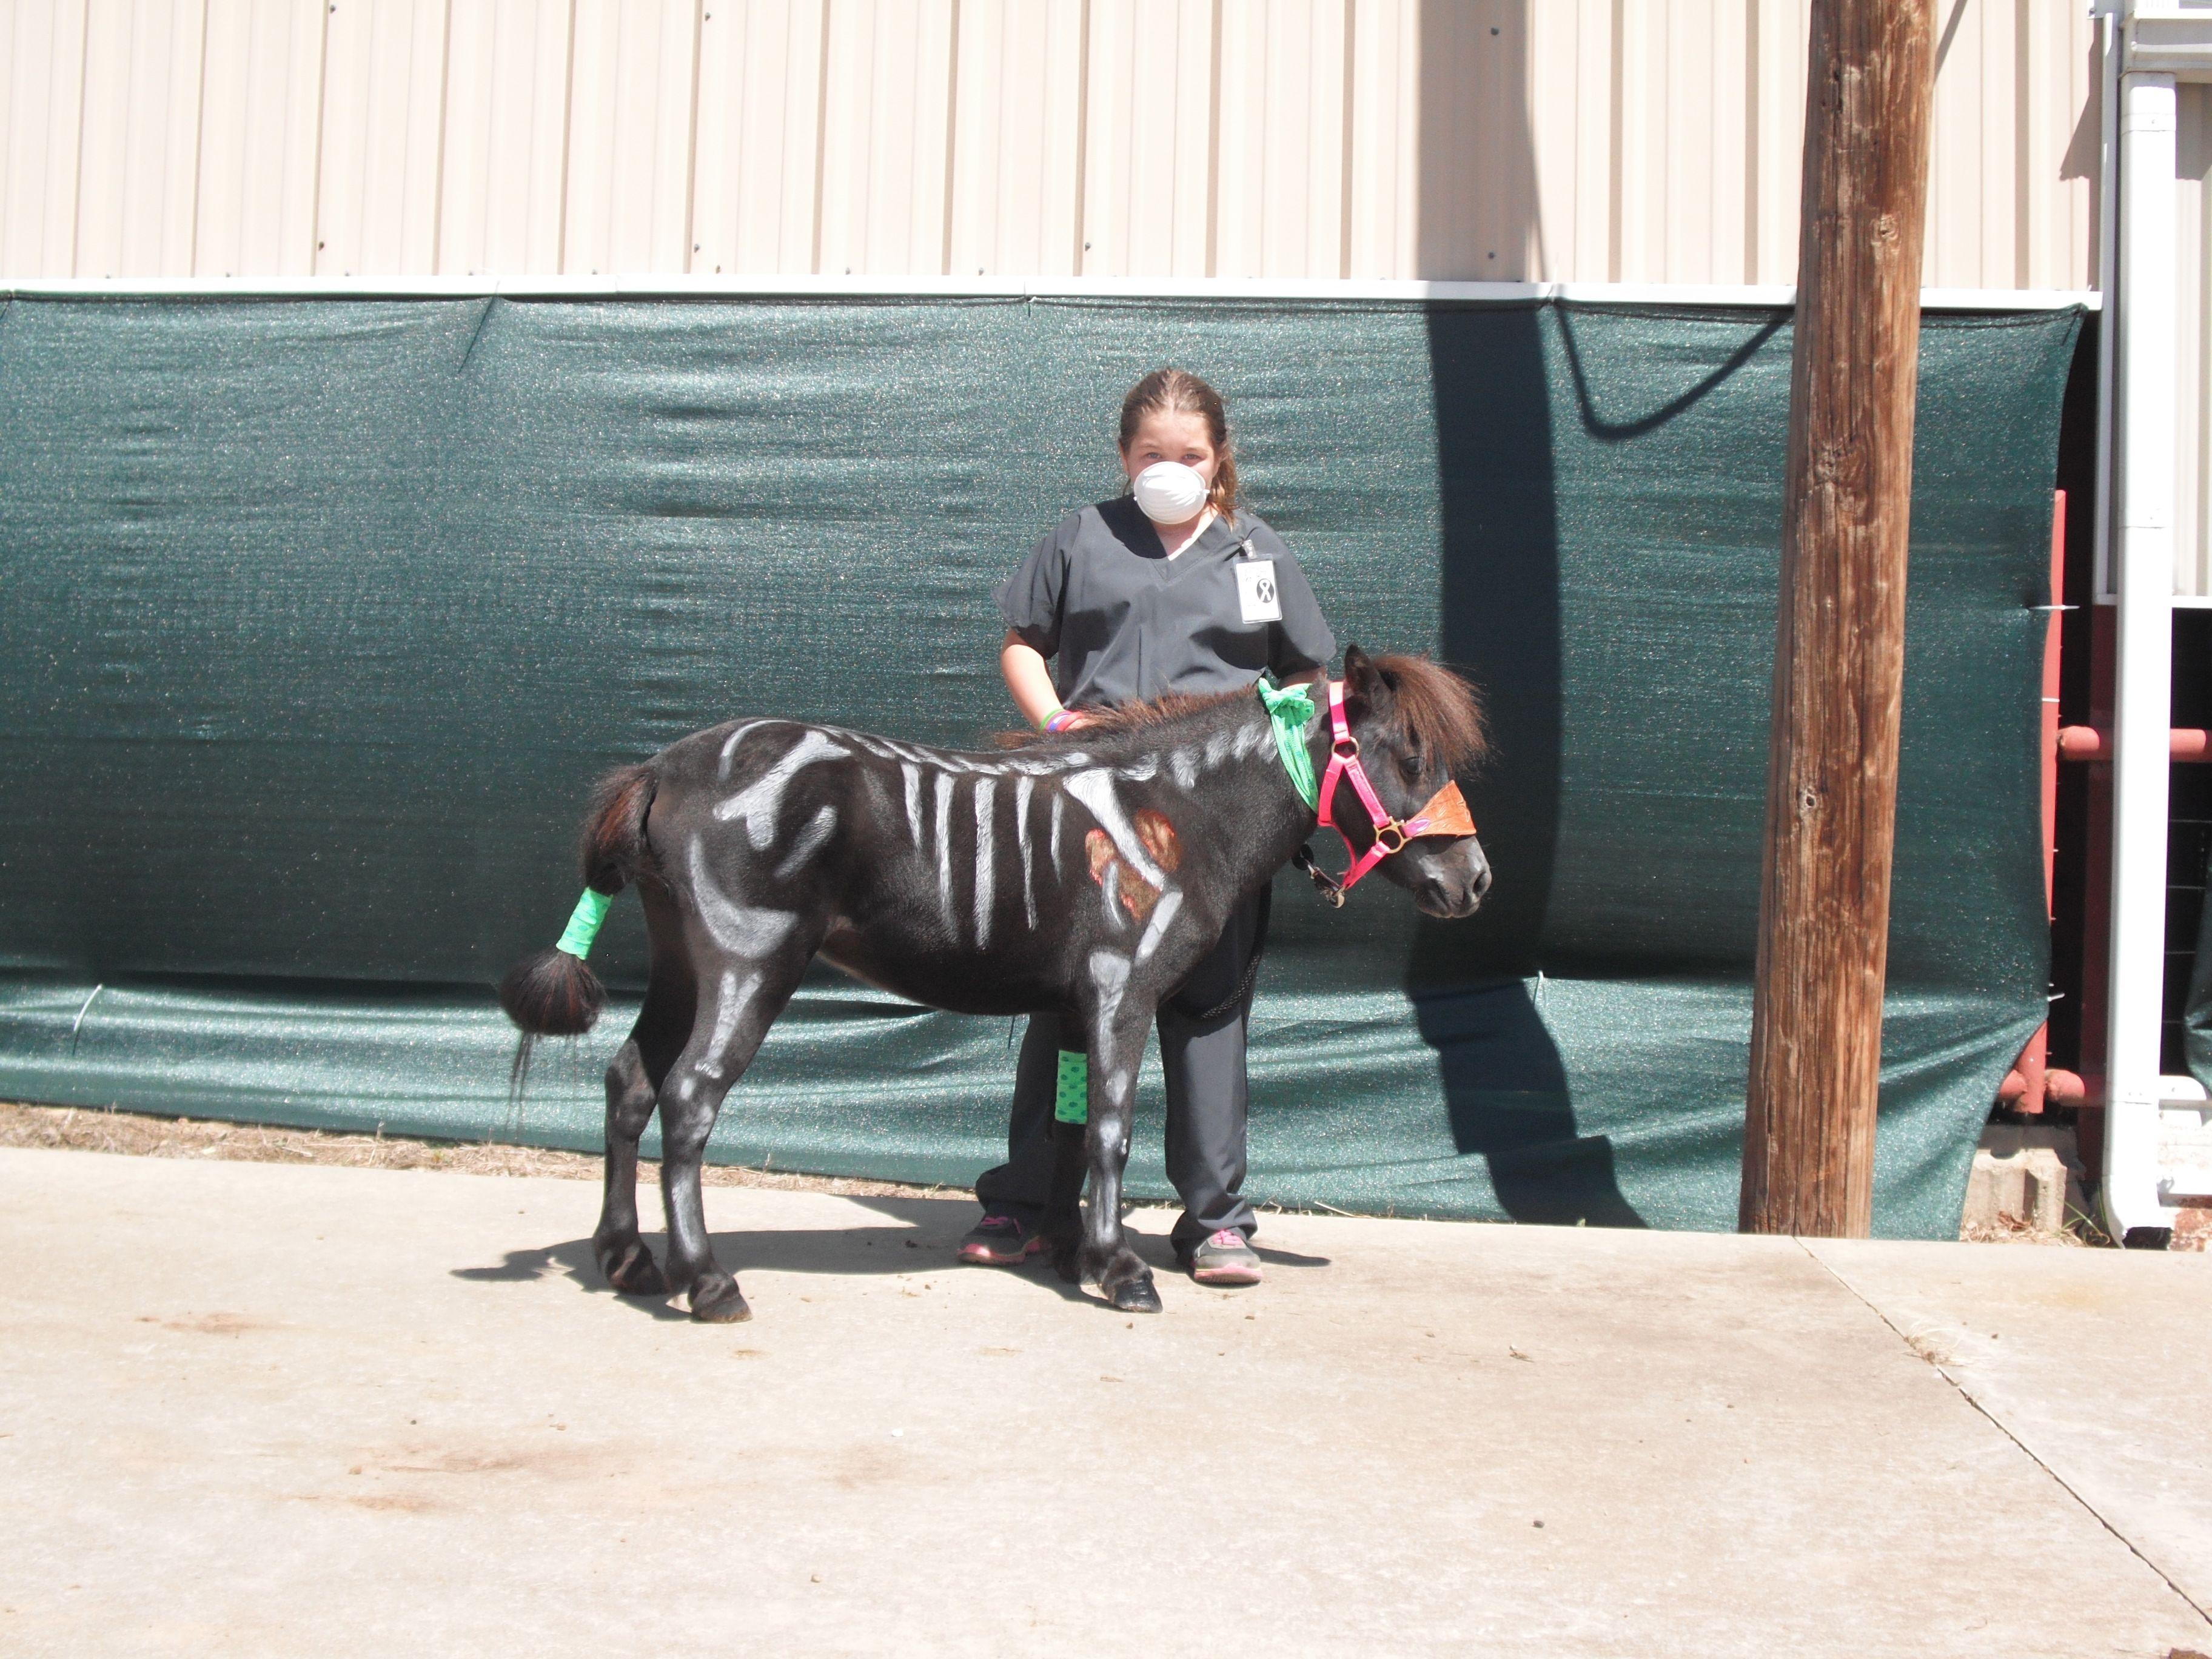 Robin Equine Costume Superhero Outfit for Mini Pony Horse   Mini Horse Costume